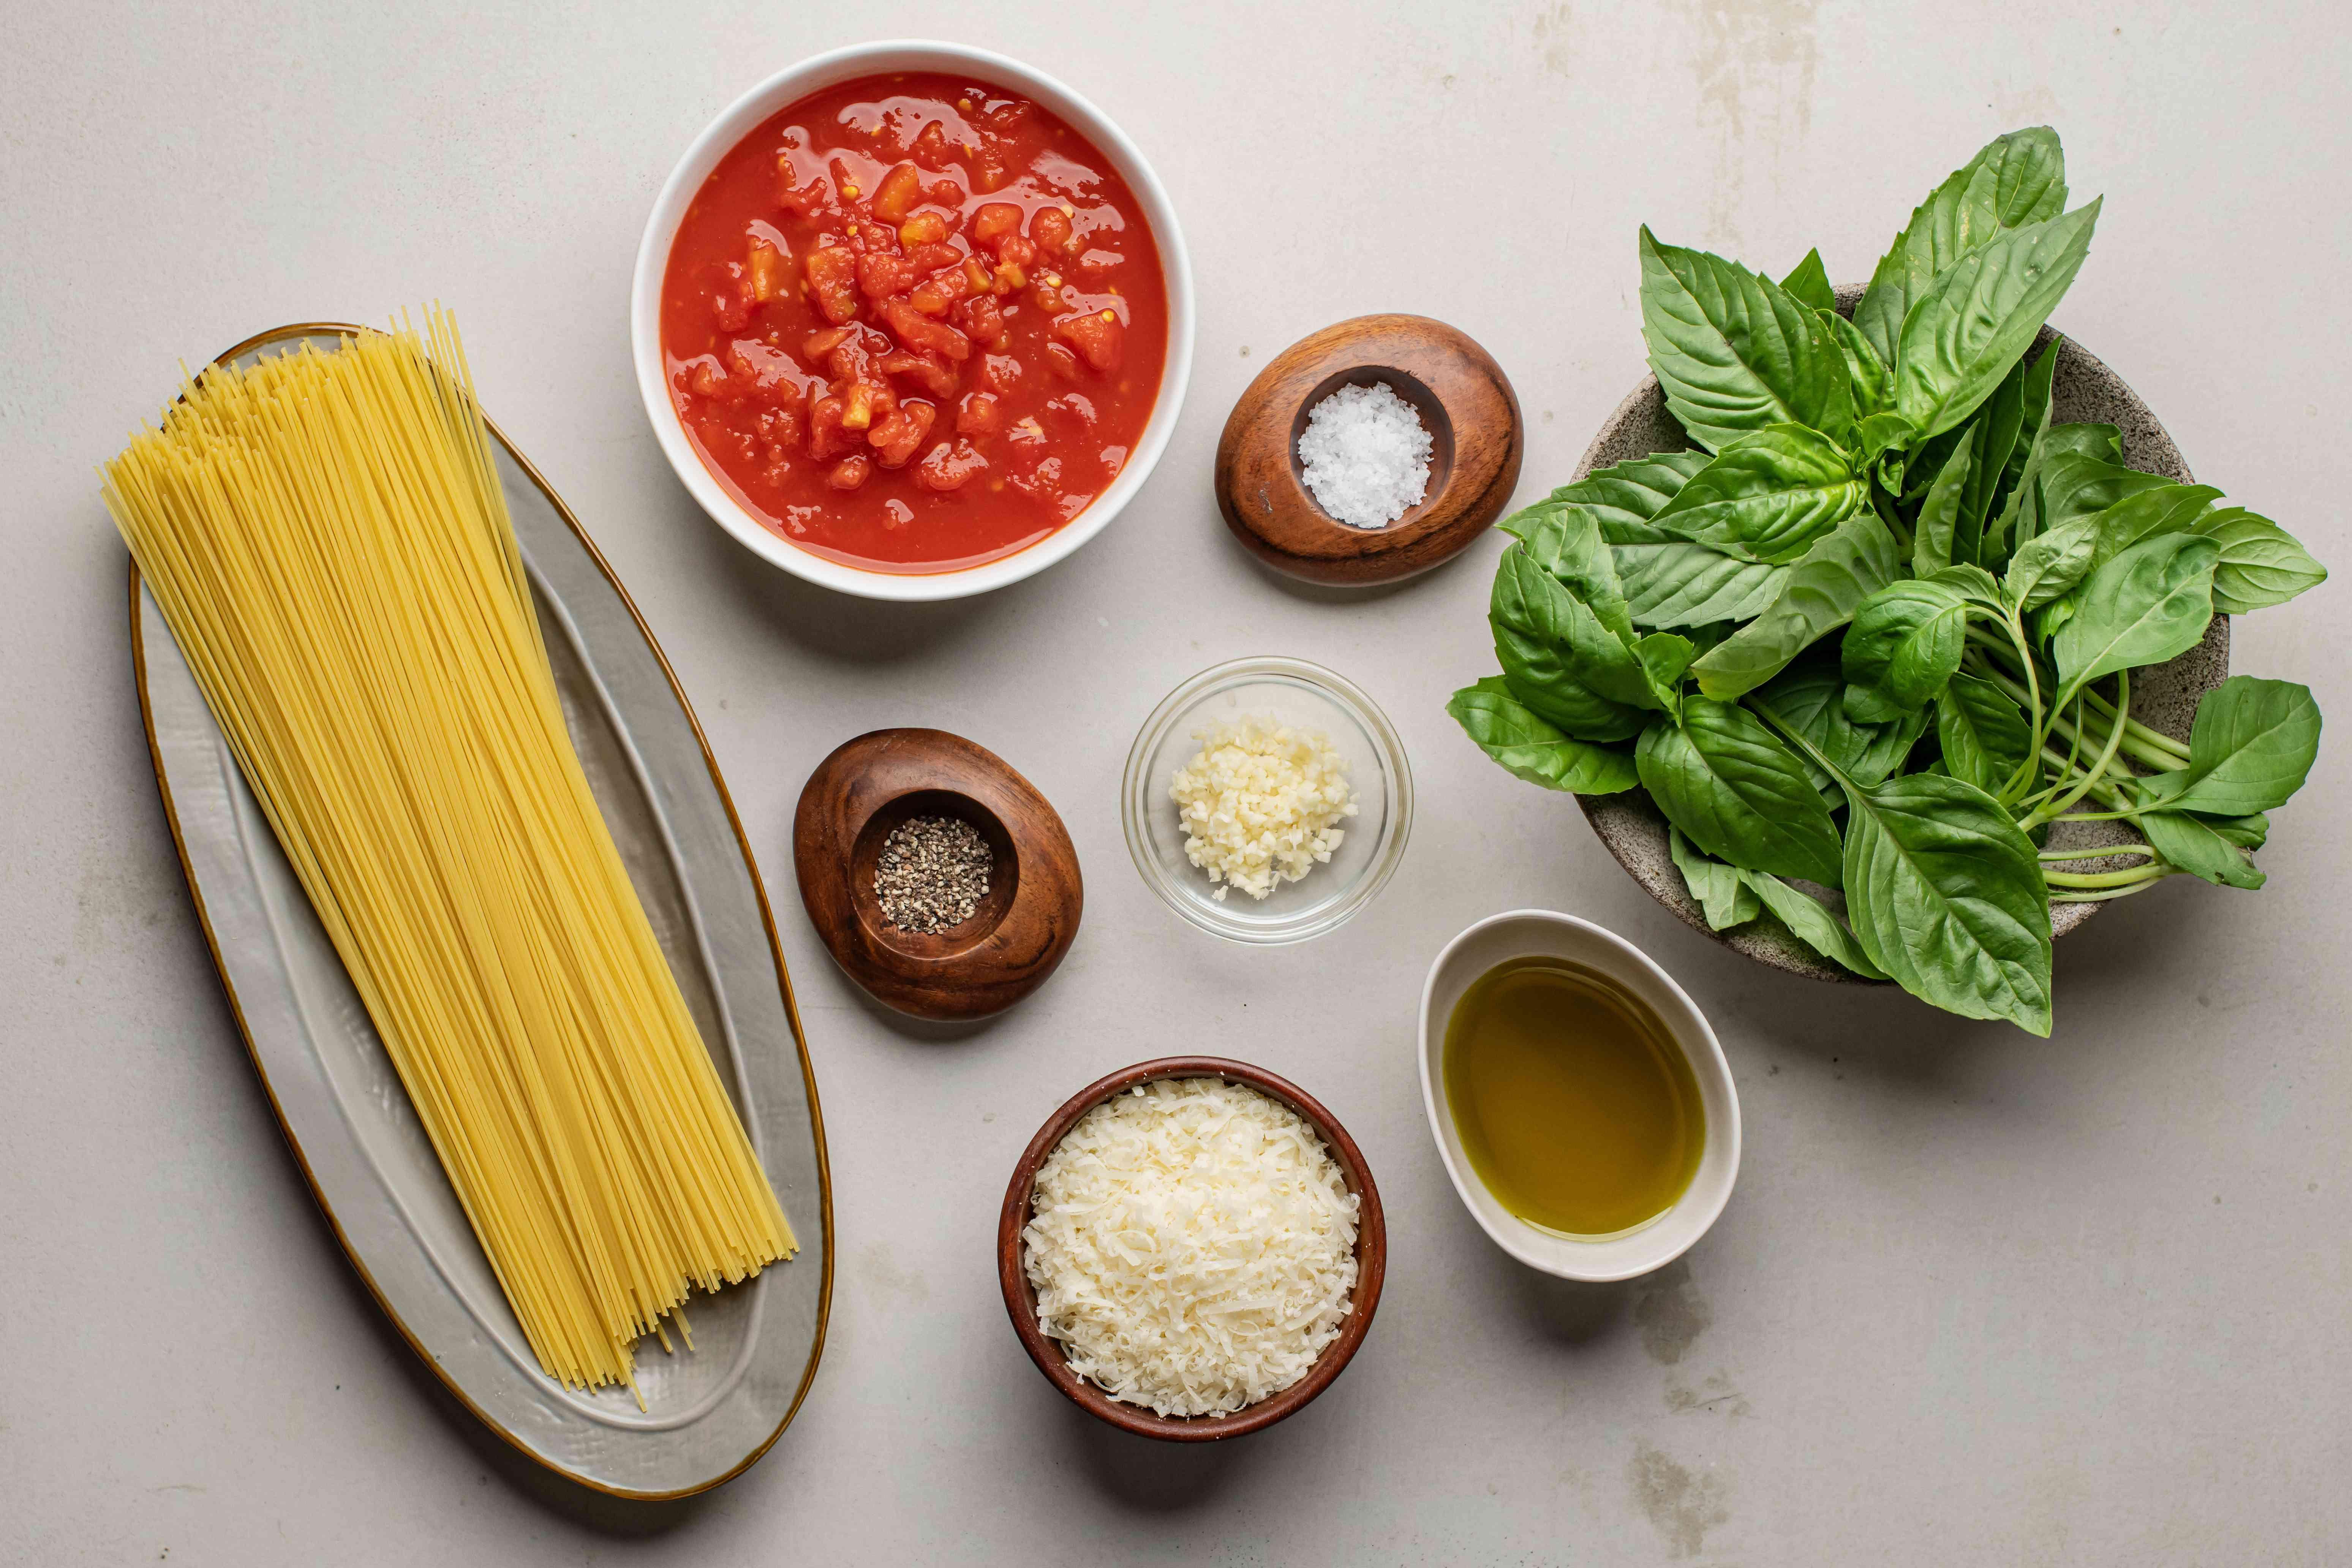 Capellini pomodoro ingredients